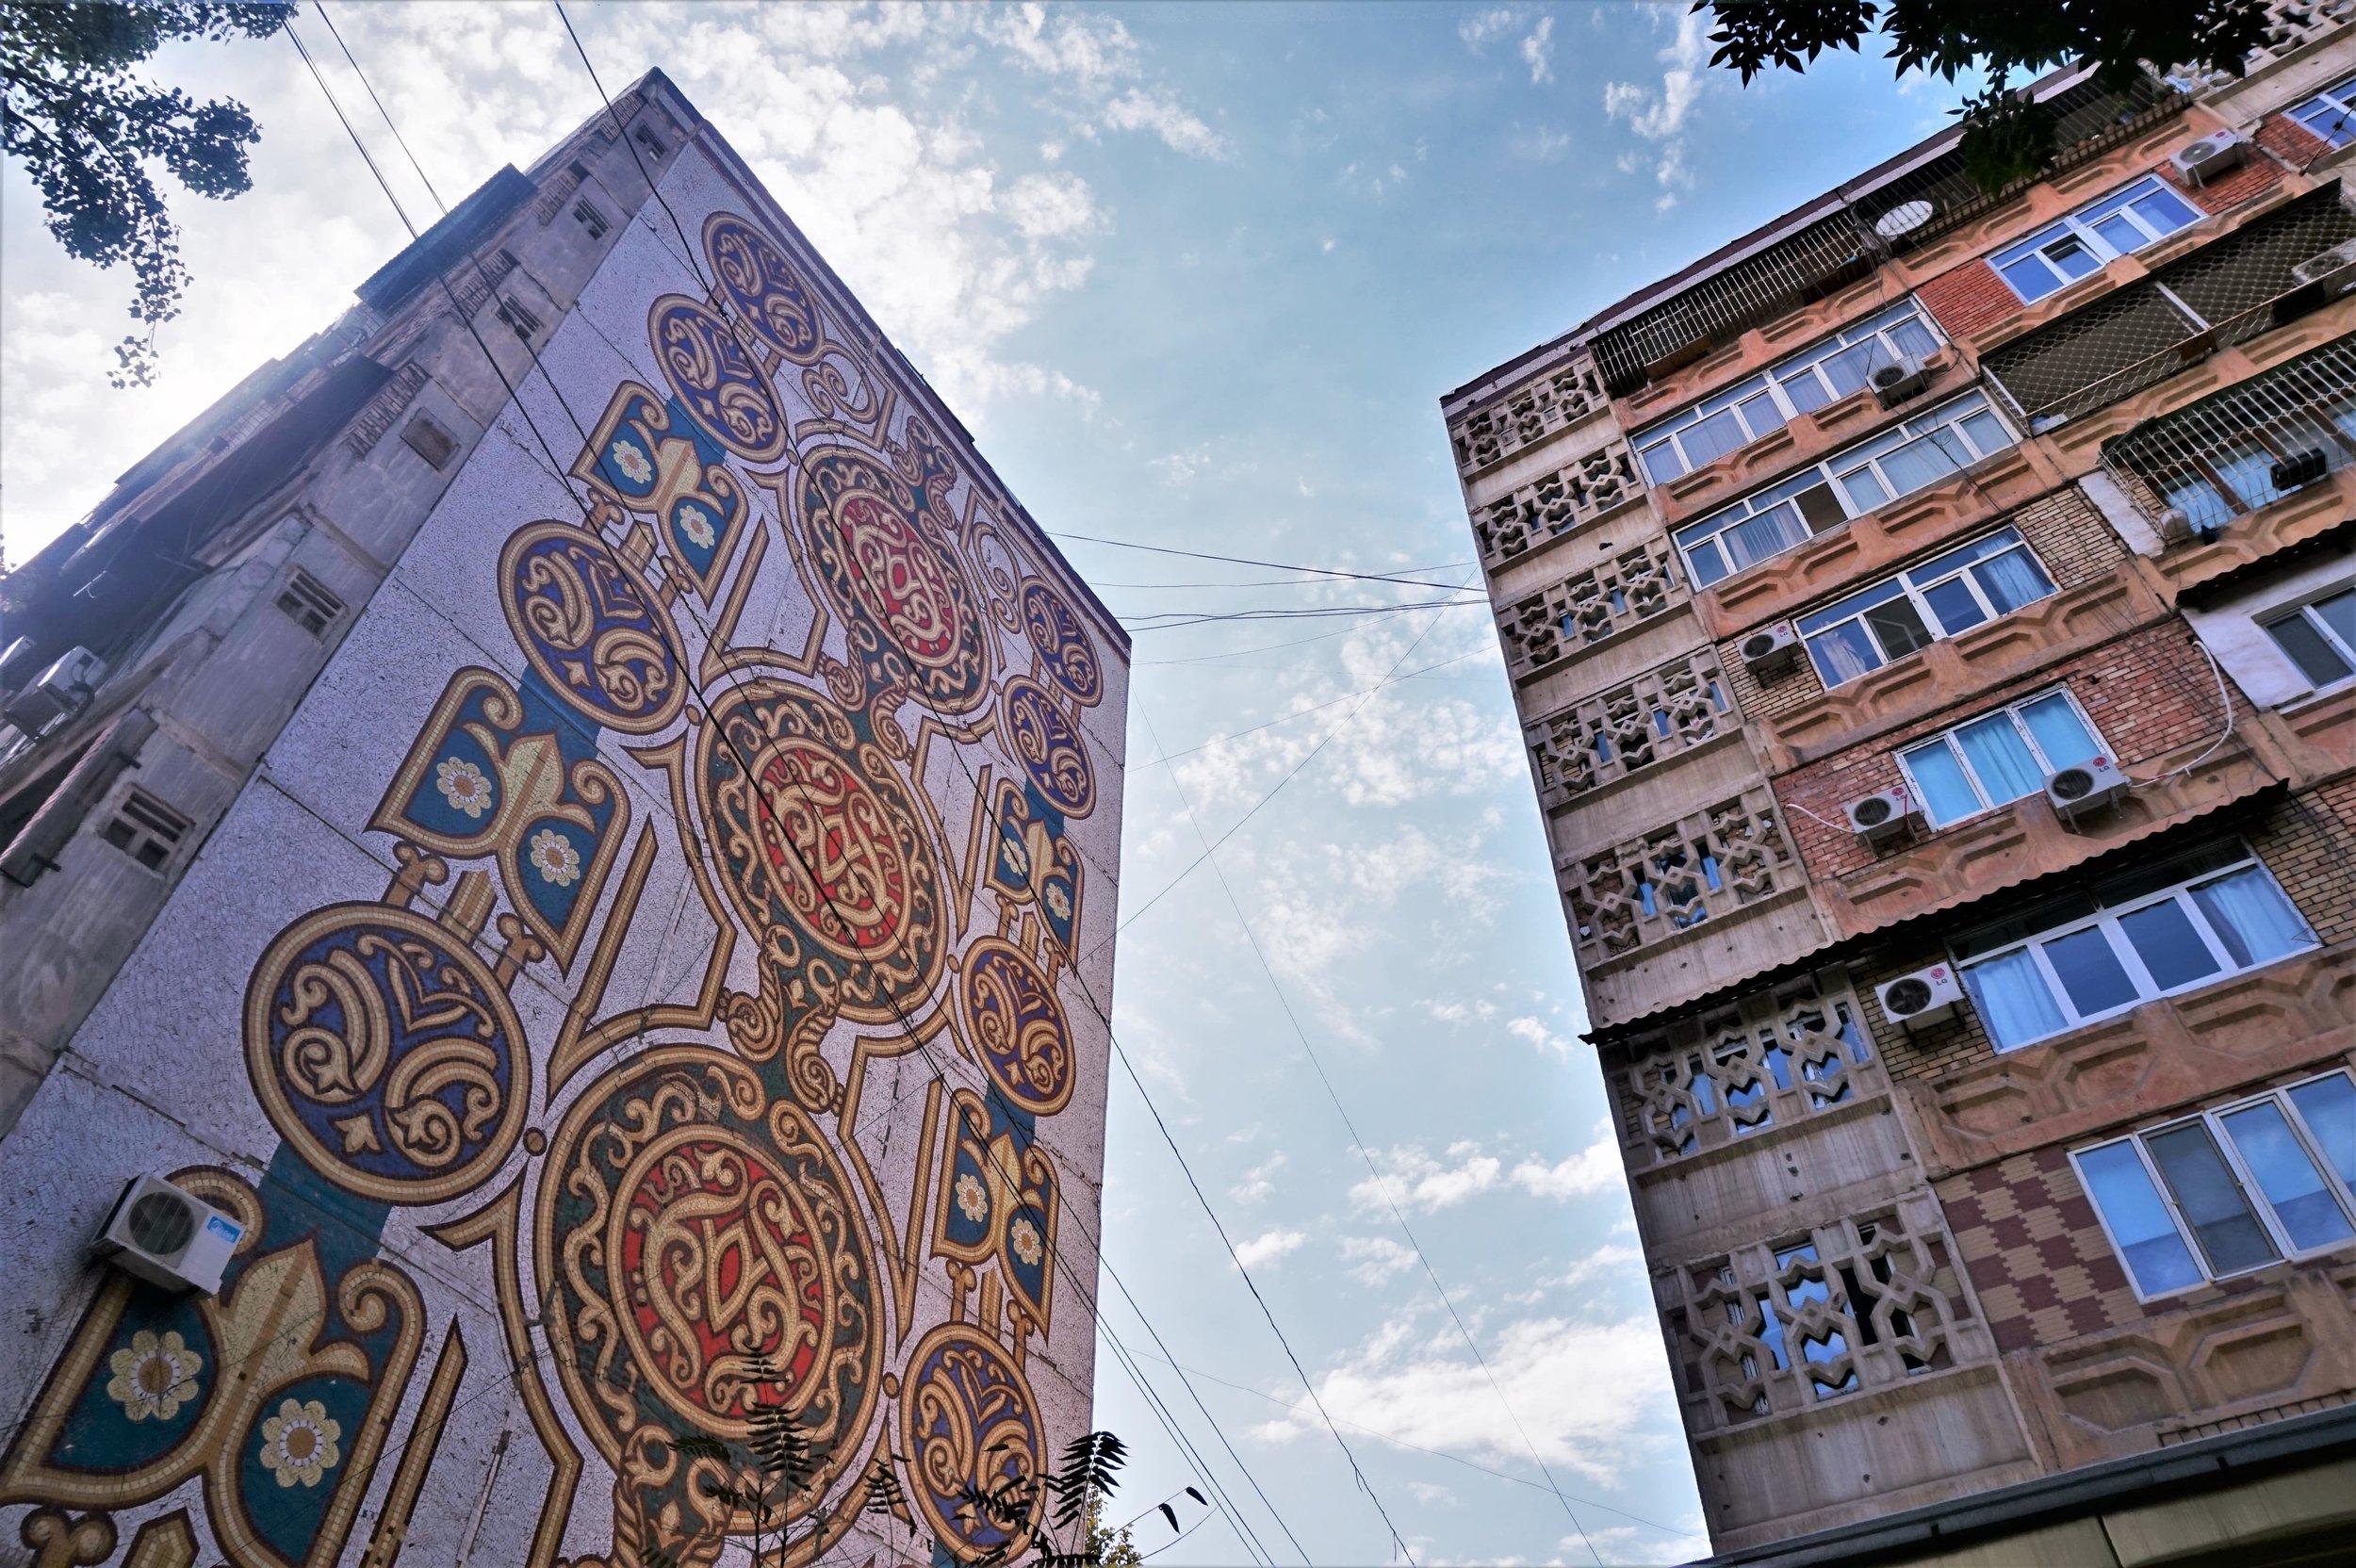 The mosaics in the streets of Tashkent are one of the best things to do in Tashkent! Best things to see in Tashkent, Uzbekistan.